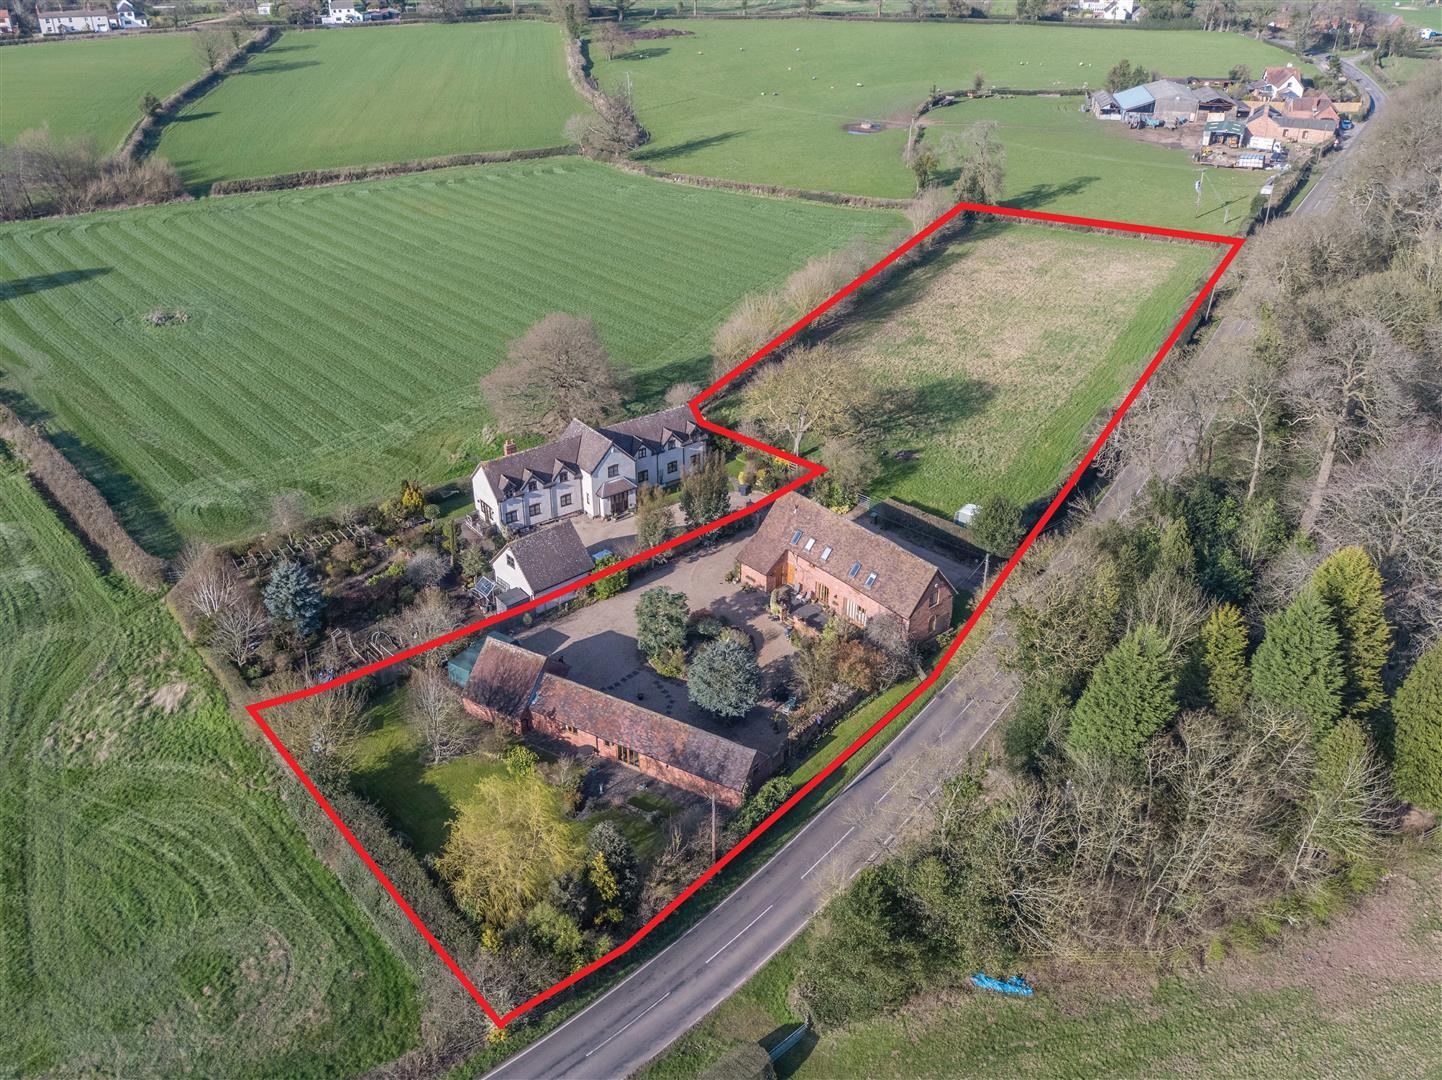 The Barn, Grange Farm, Wood End Lane, Fillongley, Coventry